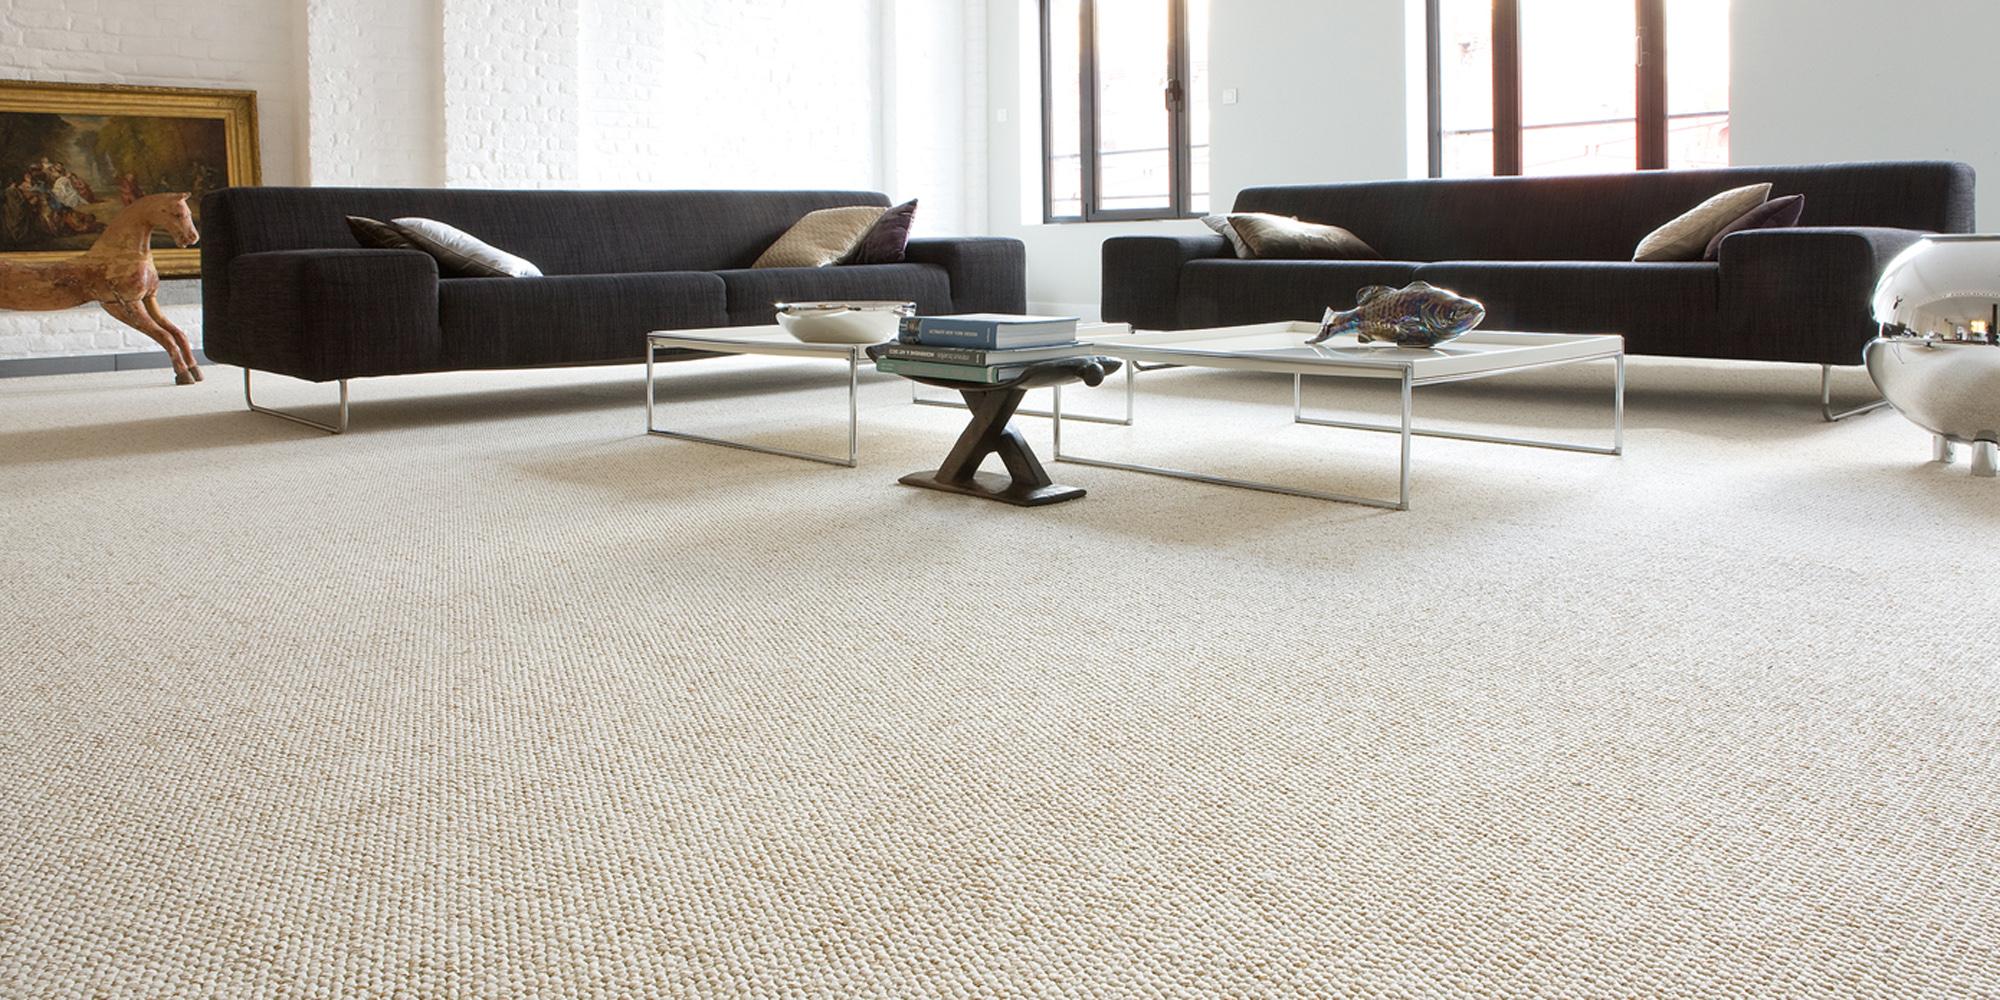 why you should use high quality carpet akron carpet. Black Bedroom Furniture Sets. Home Design Ideas